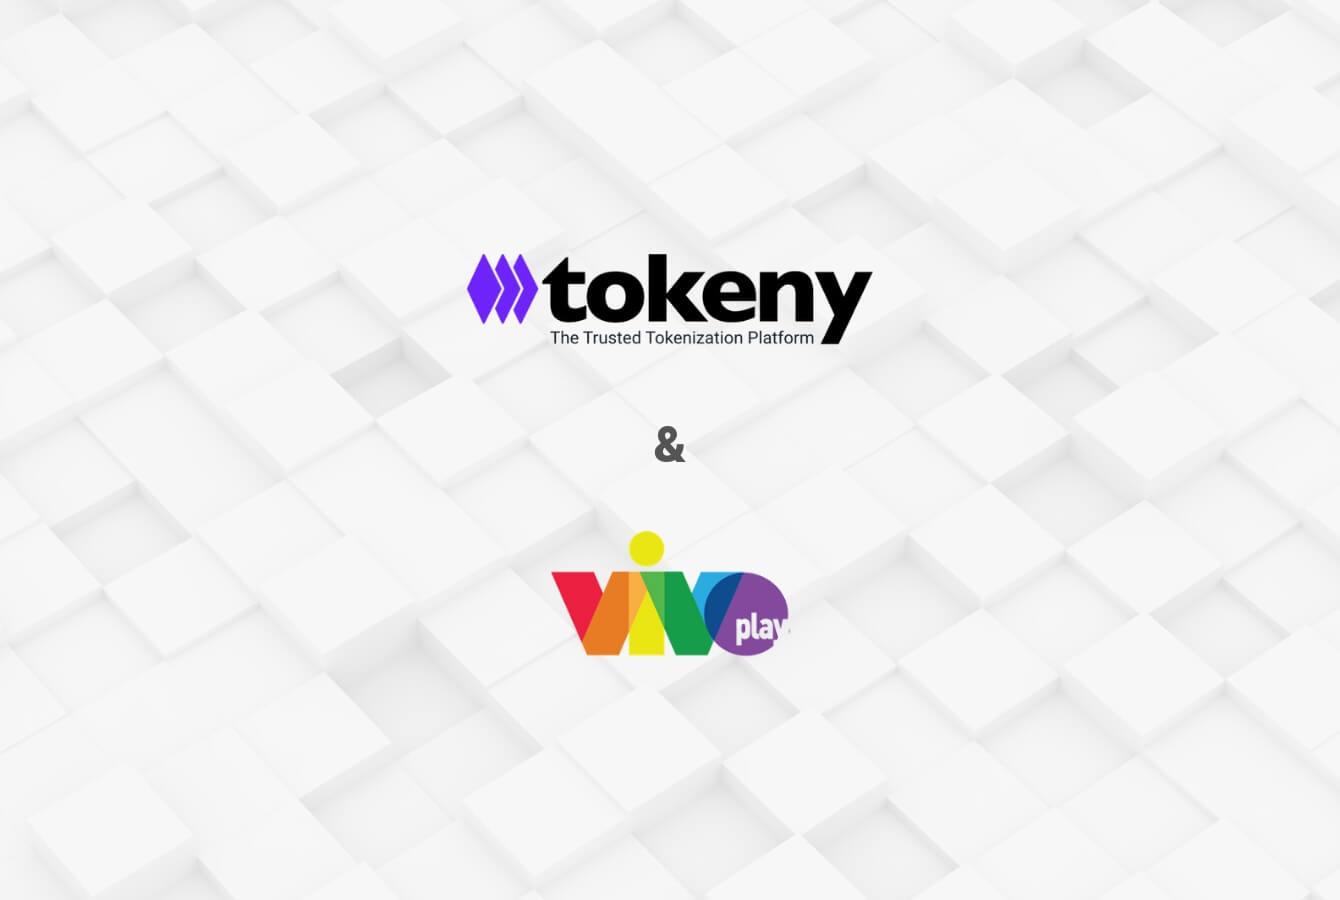 Tokeny powers the tokenization of VIVOpago, a VIVOplay brand